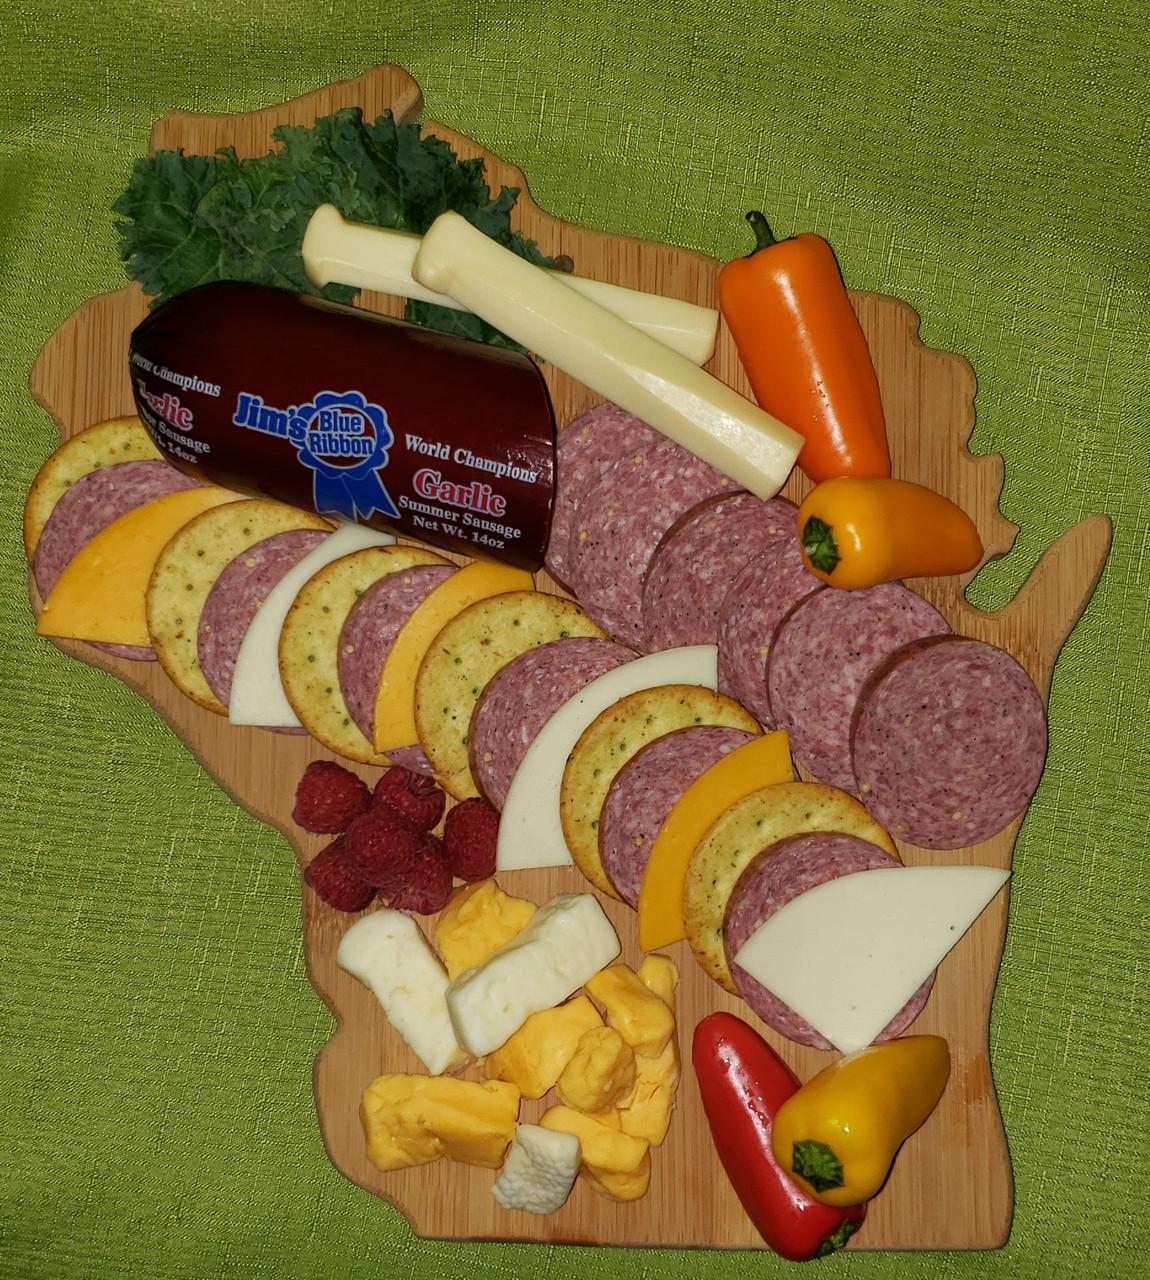 Jim's Blue Ribbon Garlic Summer Sausage 28 oz.